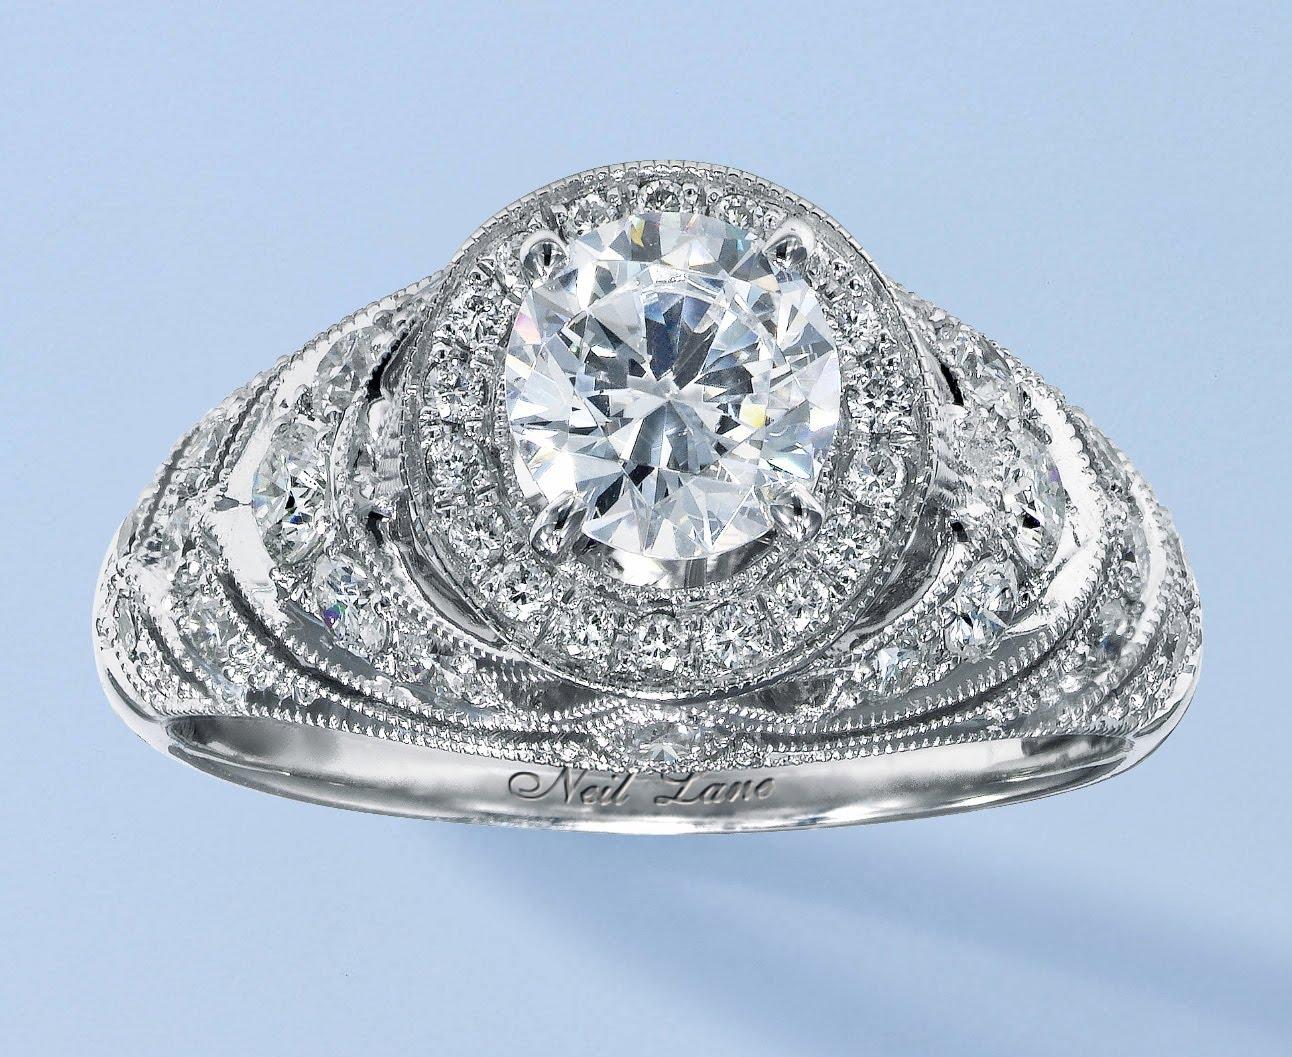 neil lane creates bridal collection for kay jewelers wedding ring Neil Lane Creates Bridal Collection for Kay Jewelers